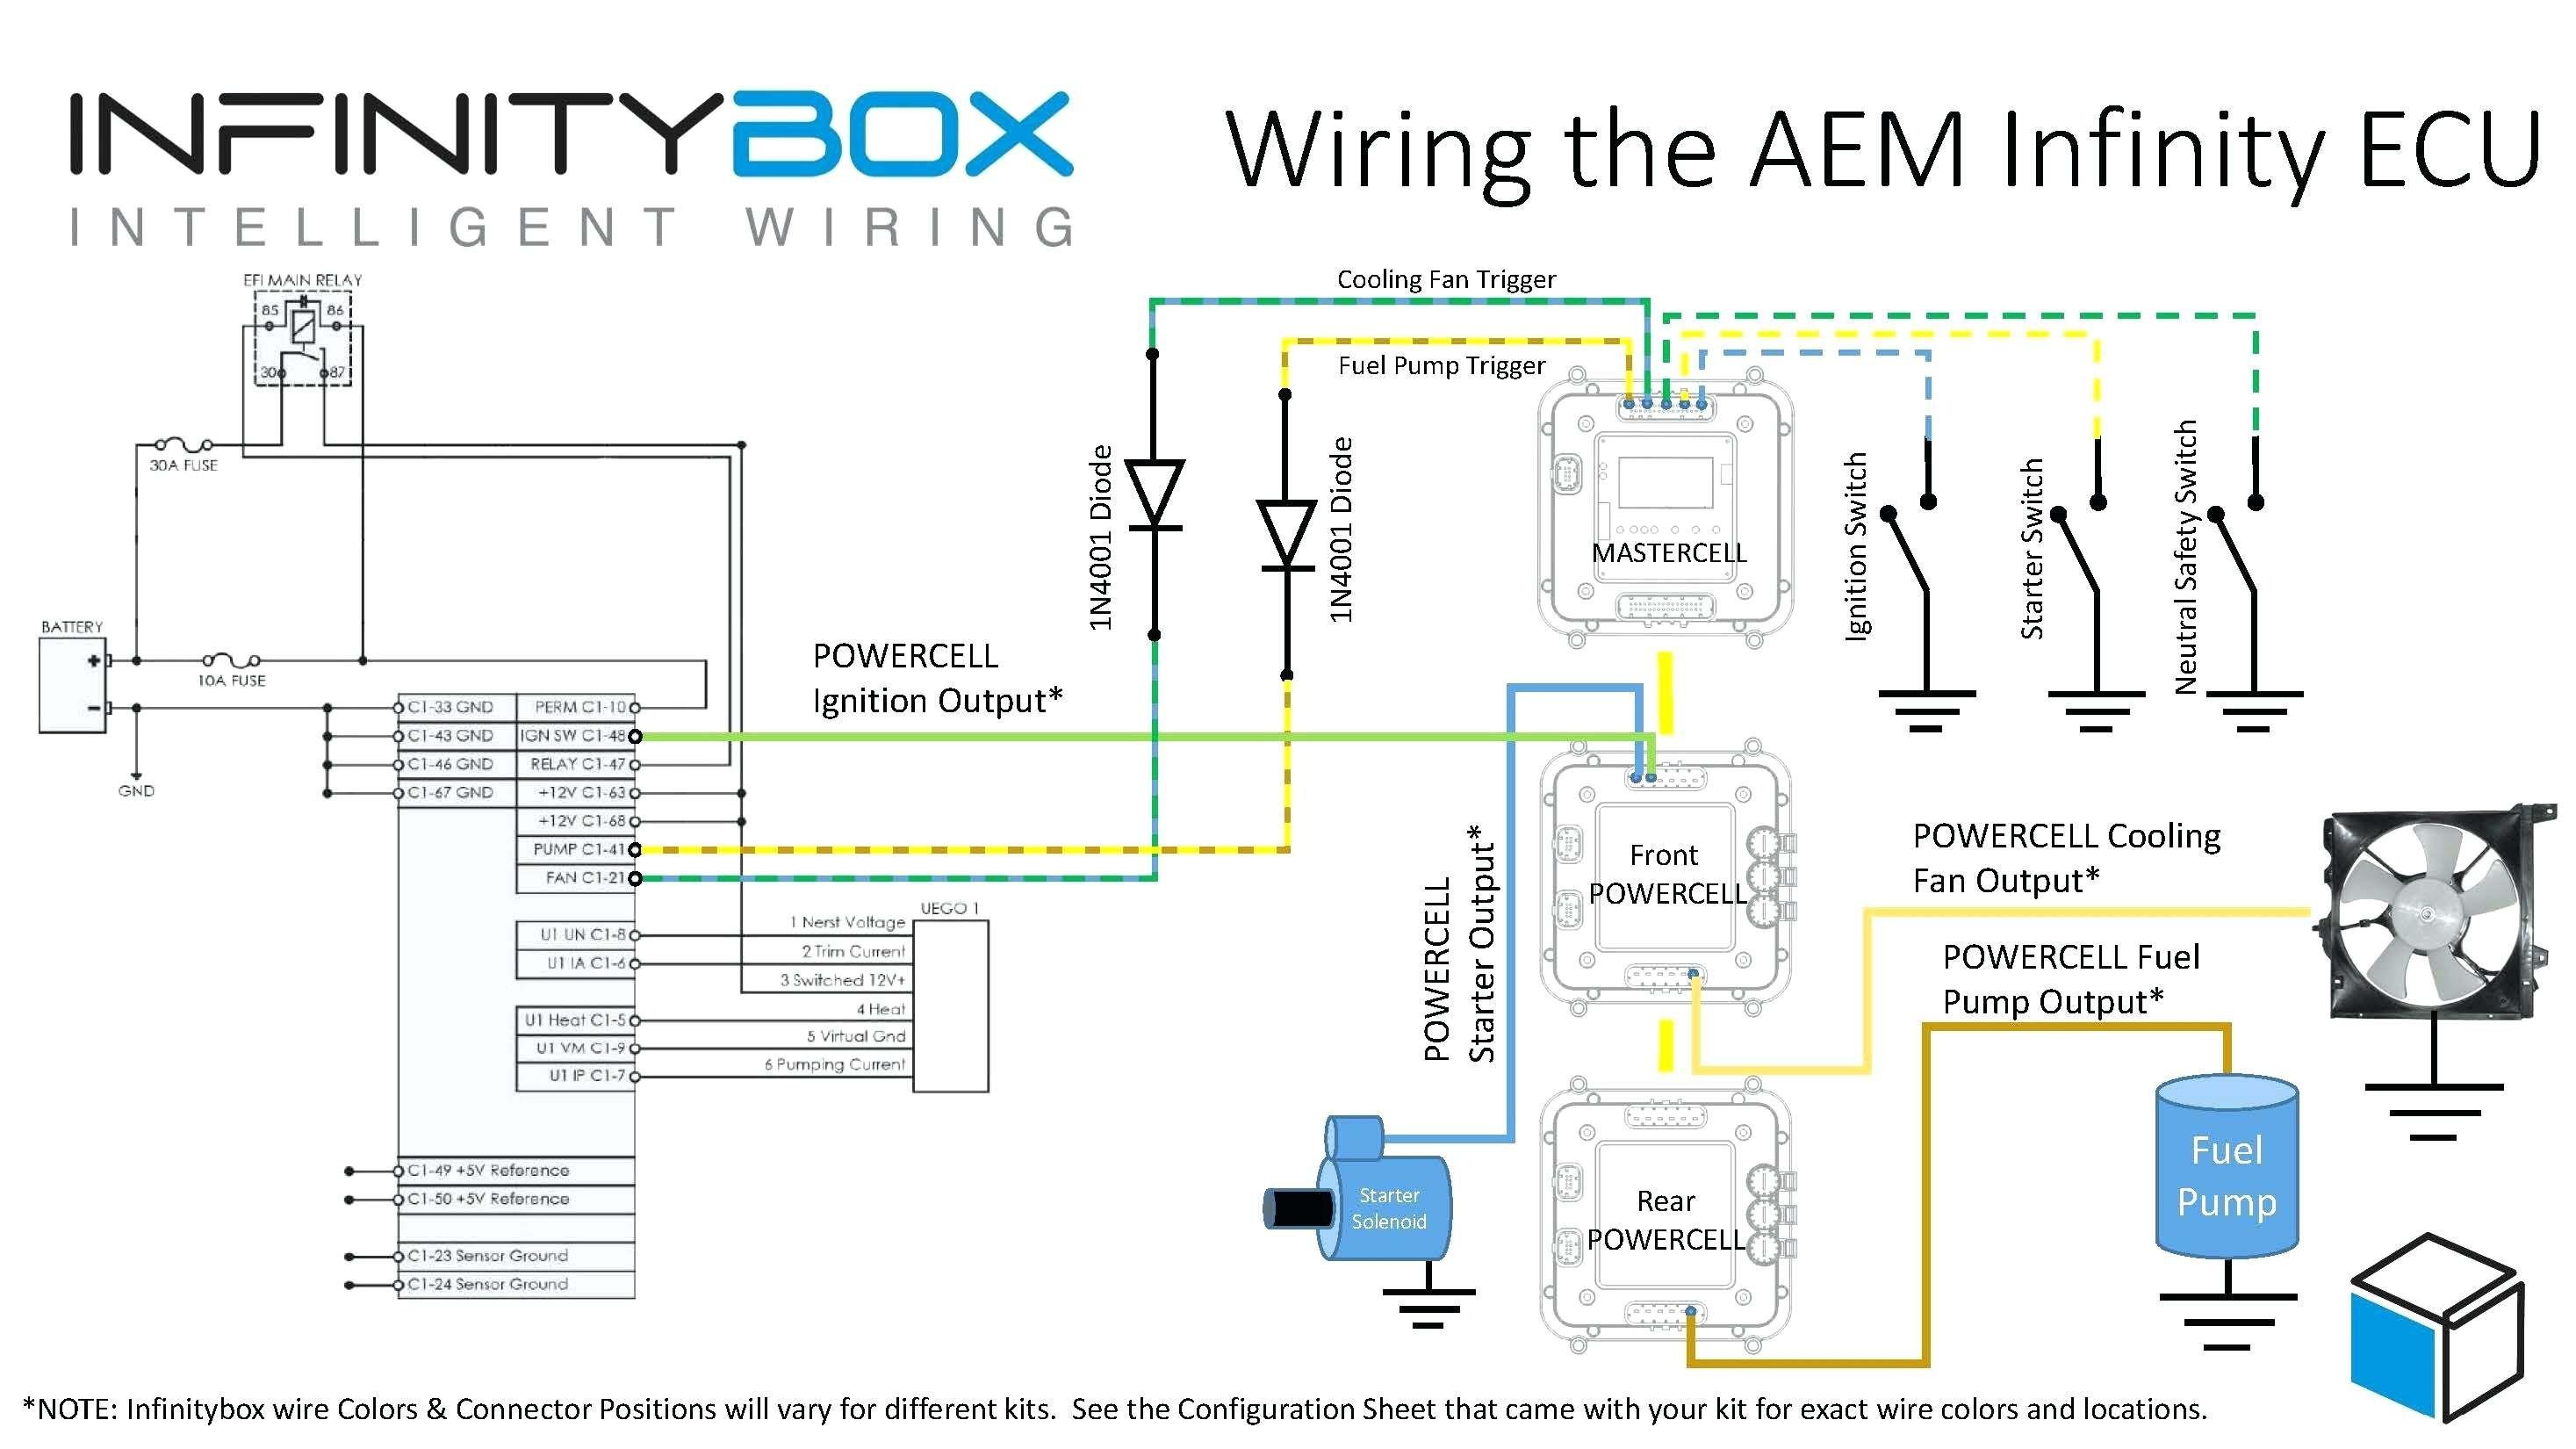 3 Prong Twist Lock Plug Wiring Diagram Beautiful Vintage Air Wiring Diagram Conditioning Inventors Performance